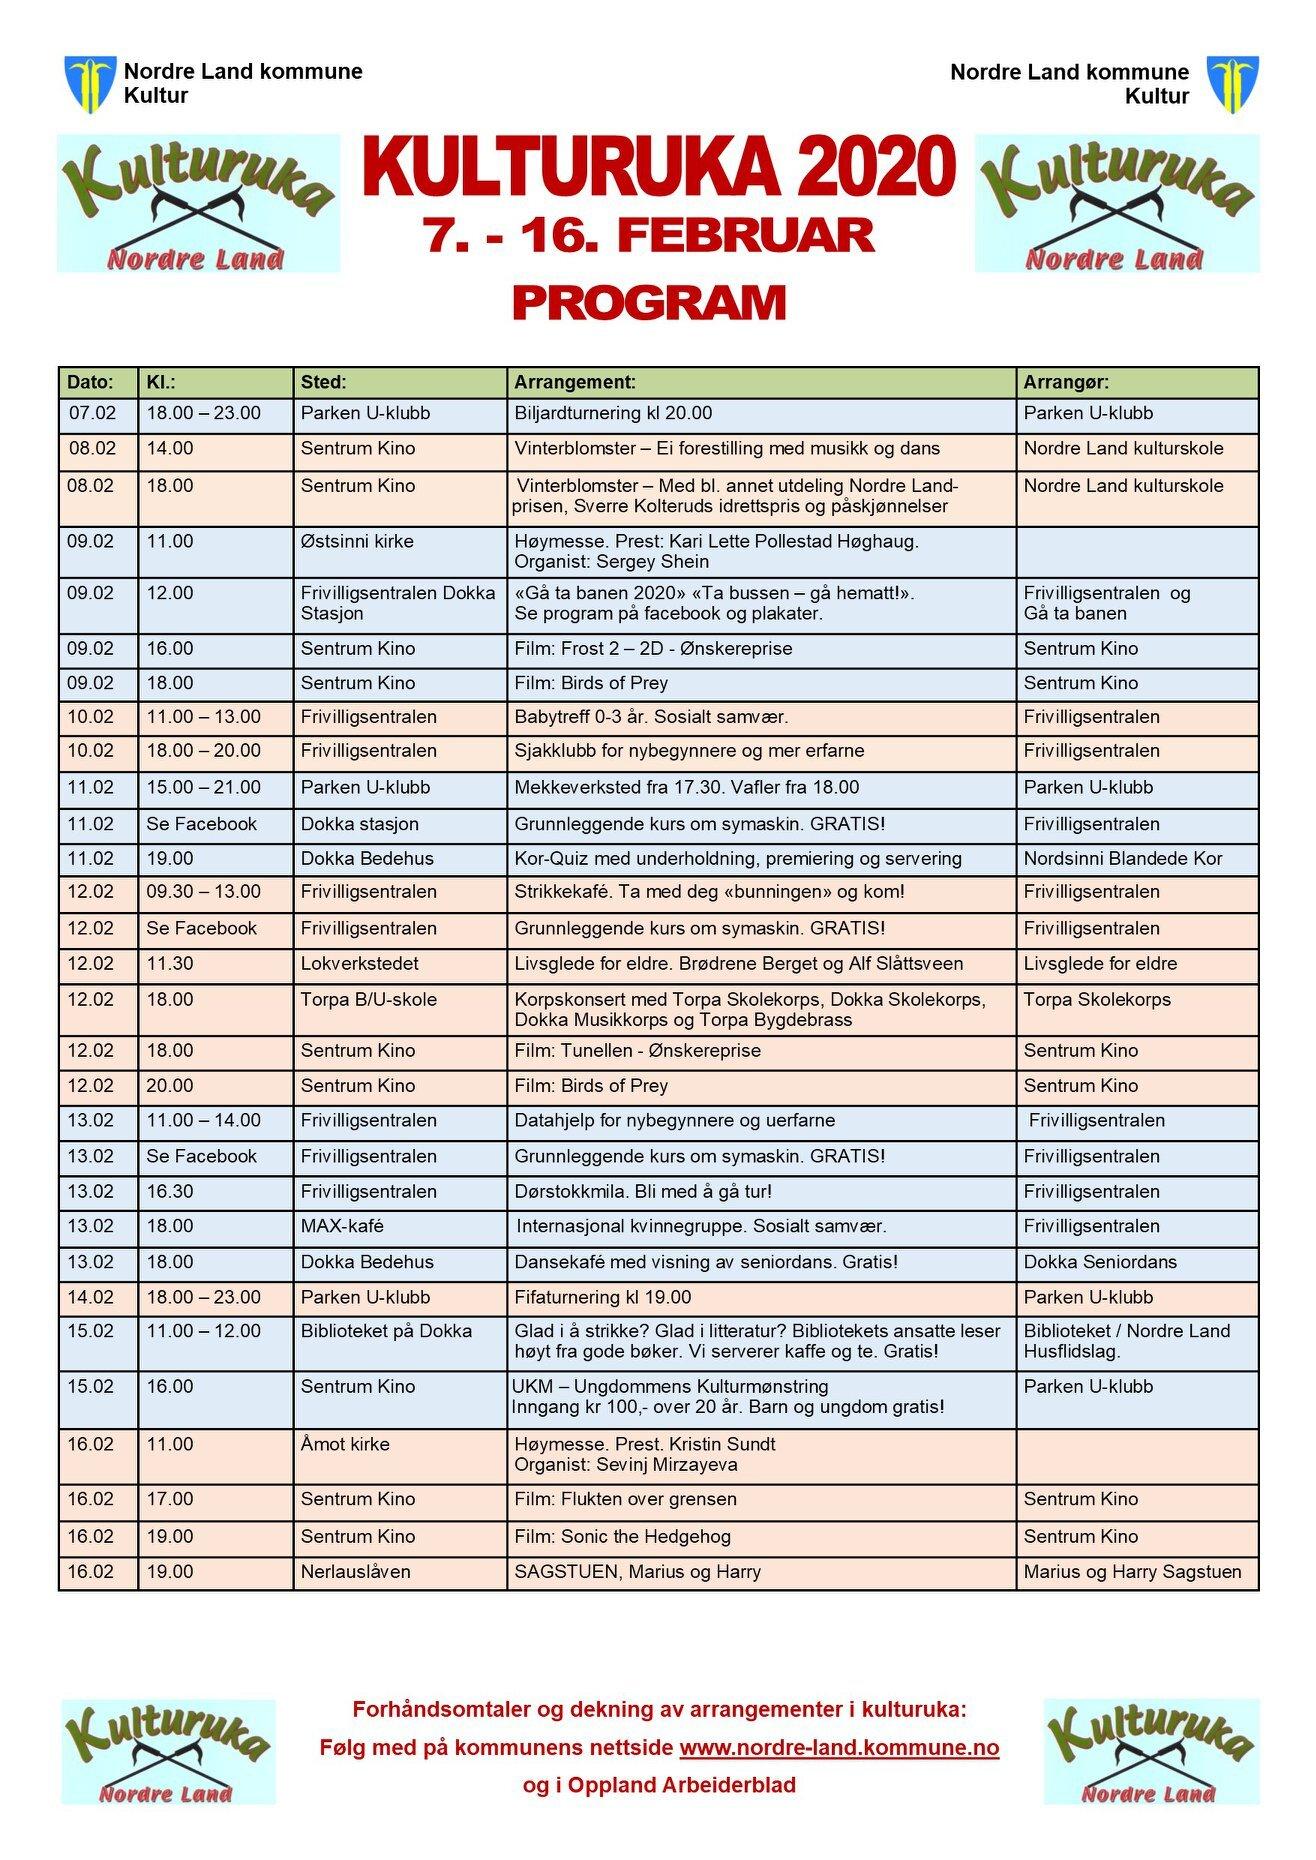 Kulturuka 2020 program.jpg